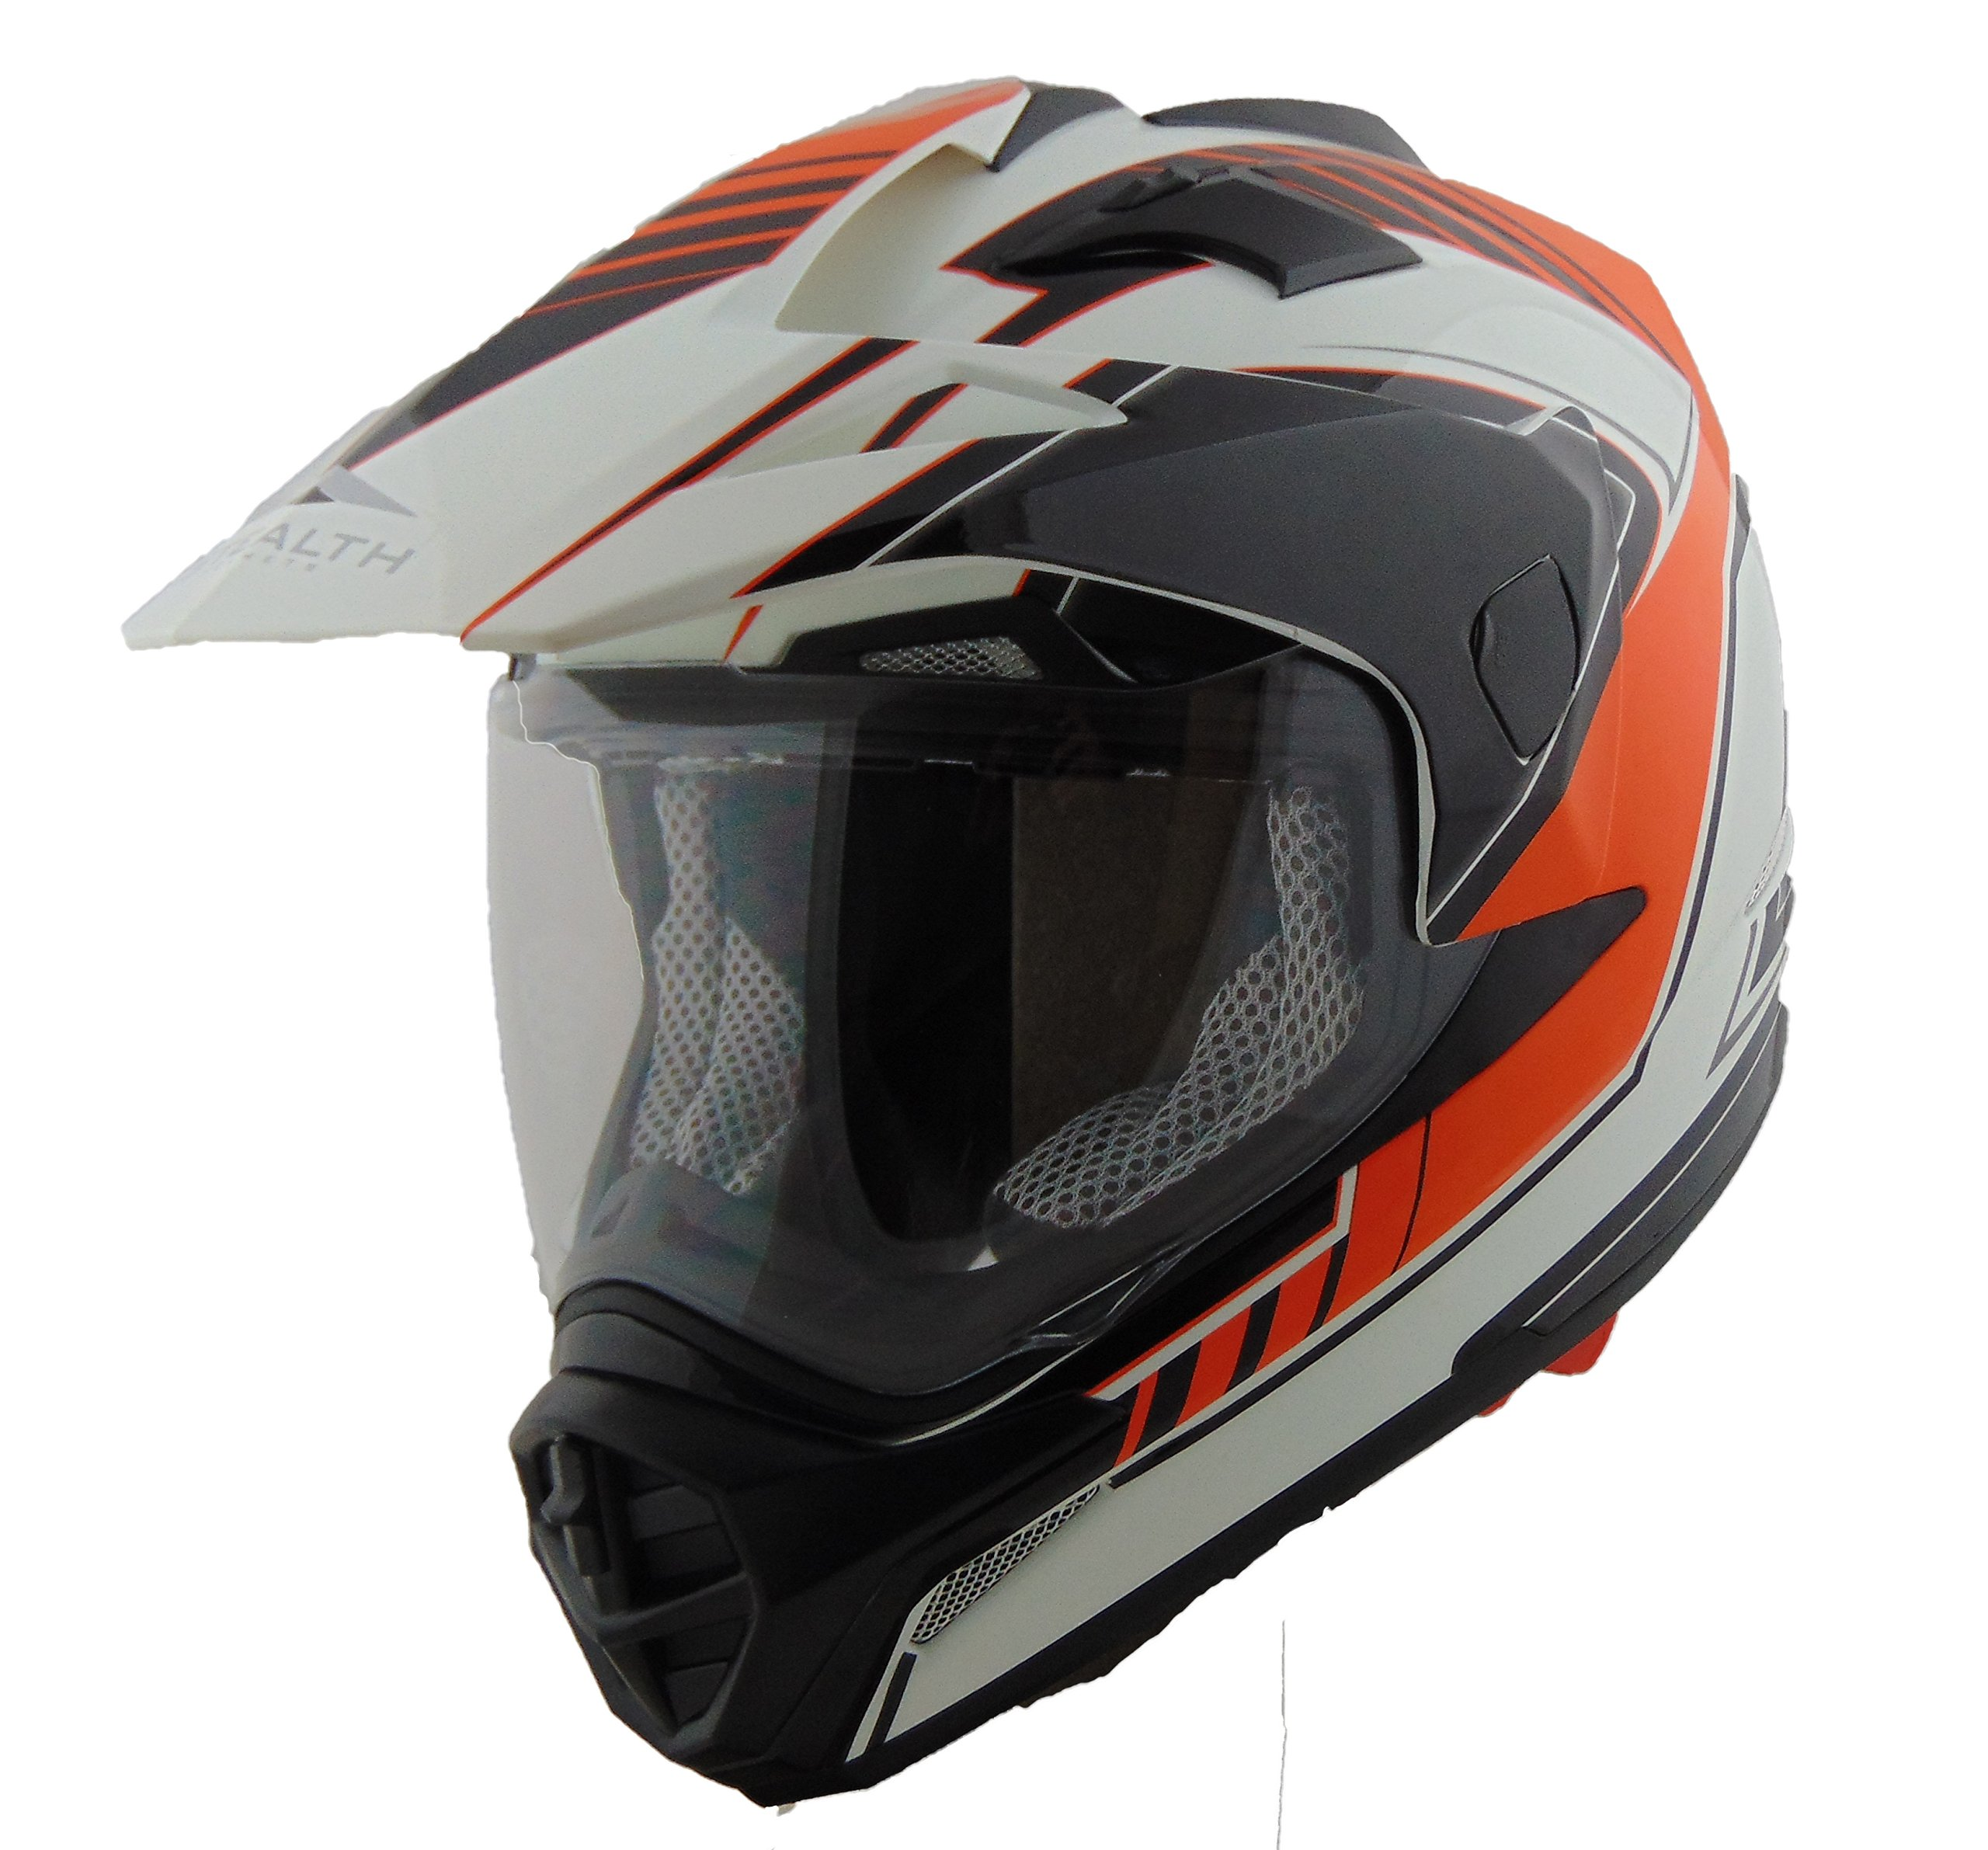 Stealth Cross Tour Dual Sport Helmet with Flow Graphic (Orange, Medium)